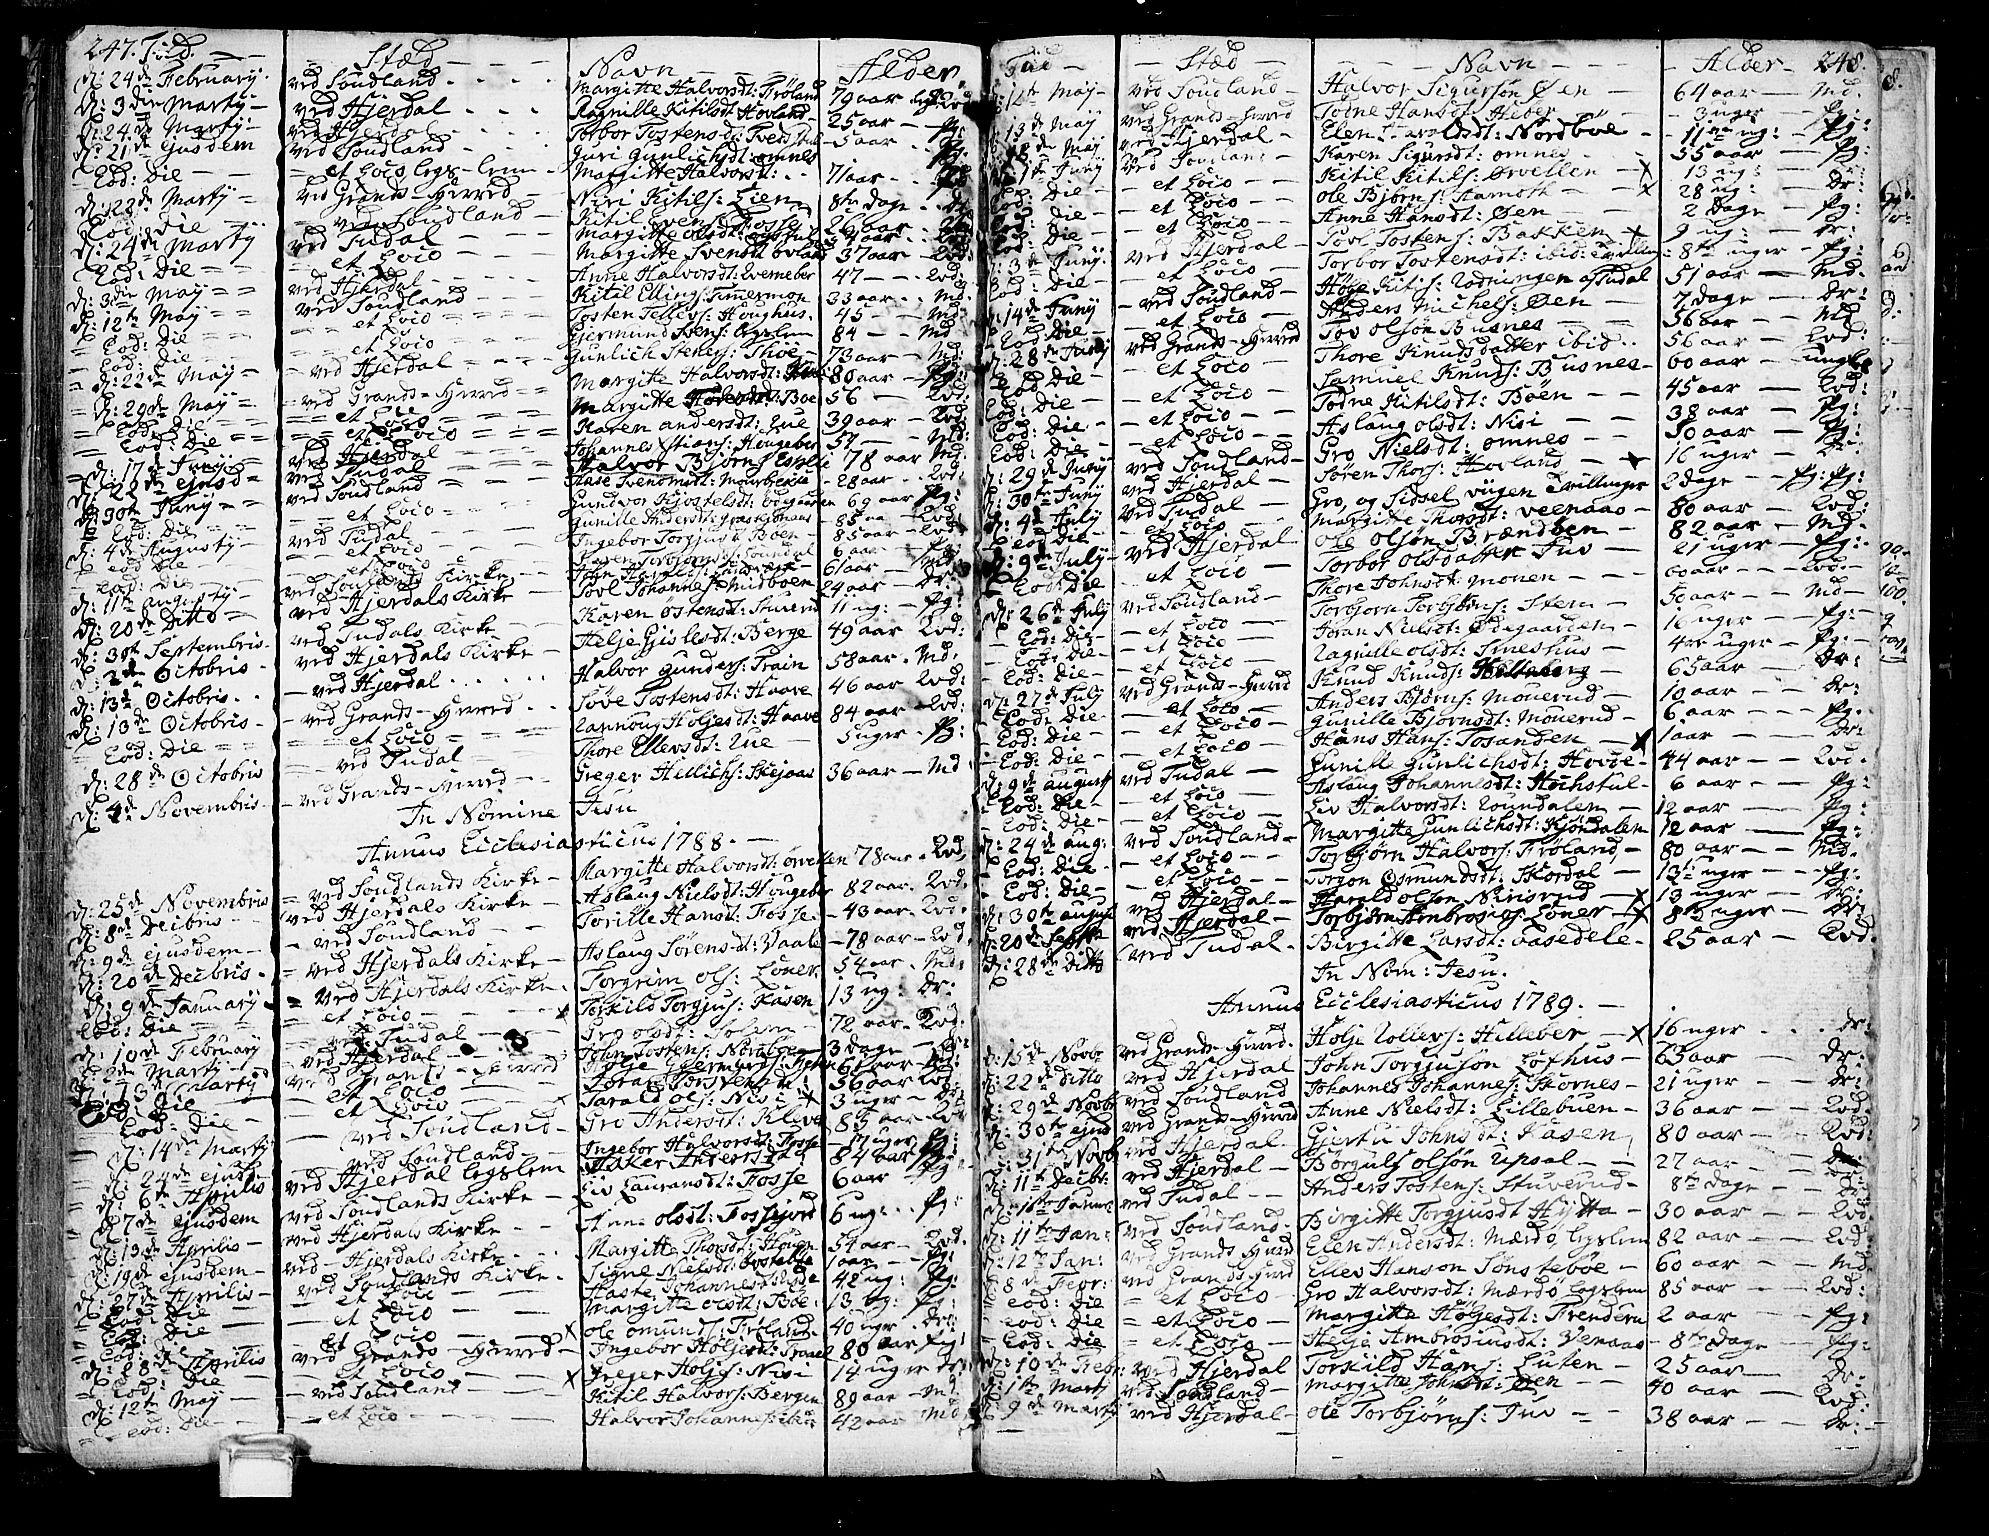 SAKO, Hjartdal kirkebøker, F/Fa/L0005: Ministerialbok nr. I 5, 1776-1801, s. 247-248